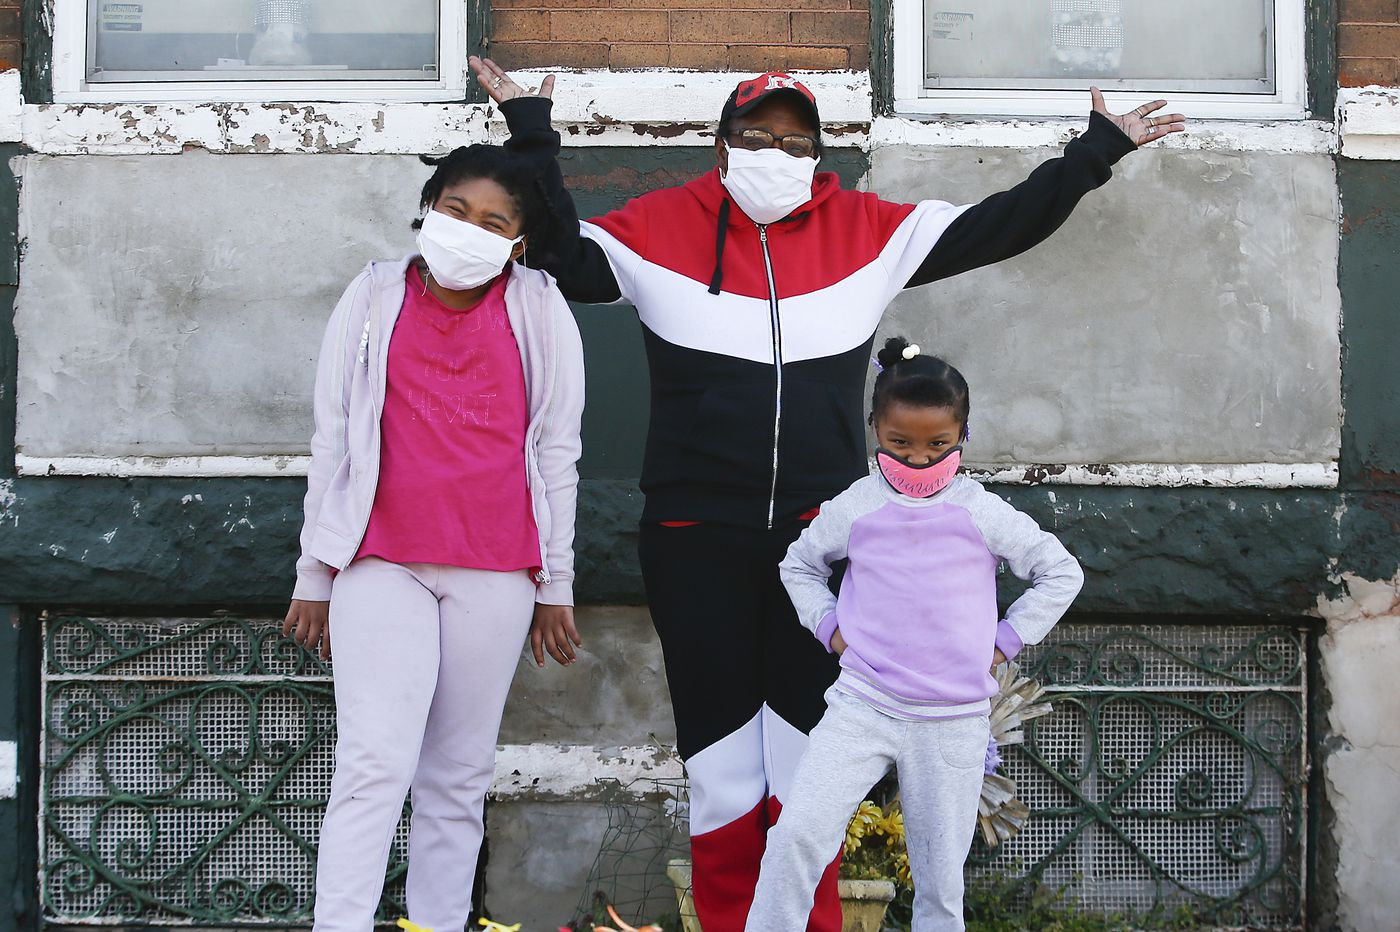 No internet. No backup plan: What happens to seniors raising grandkids in the pandemic?